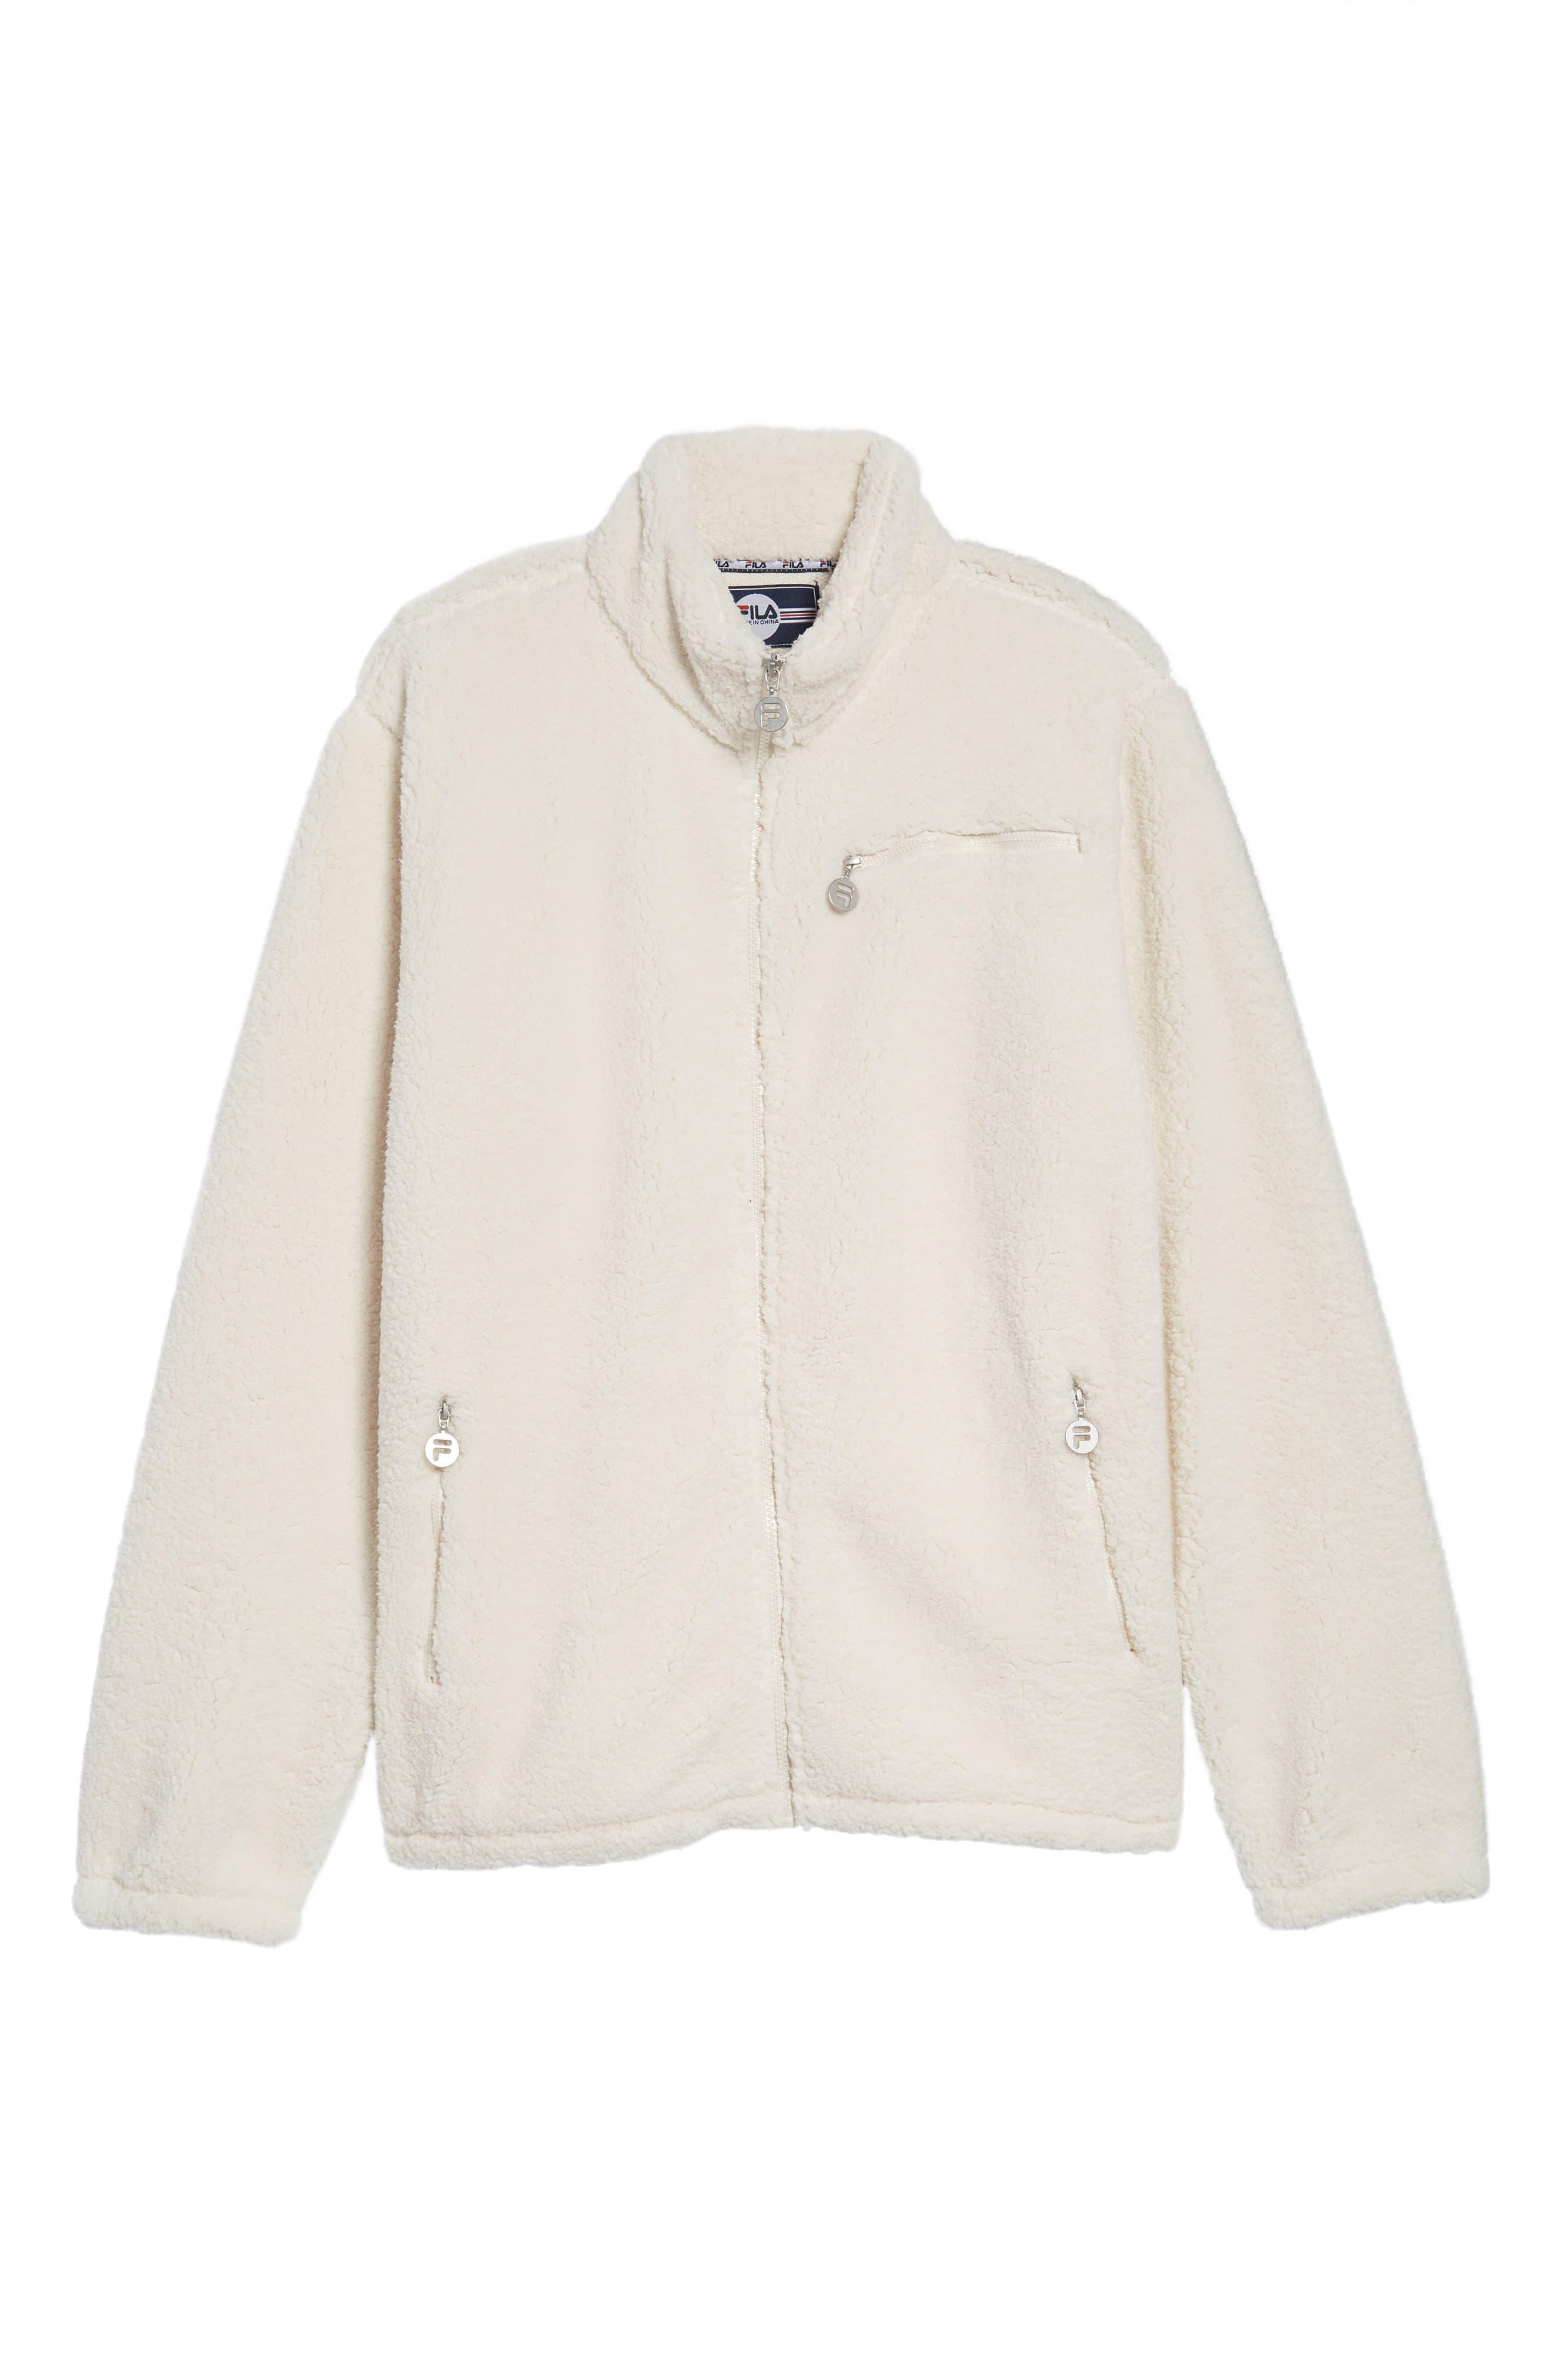 Finlay Fleece Jacket,                             Alternate thumbnail 6, color,                             250